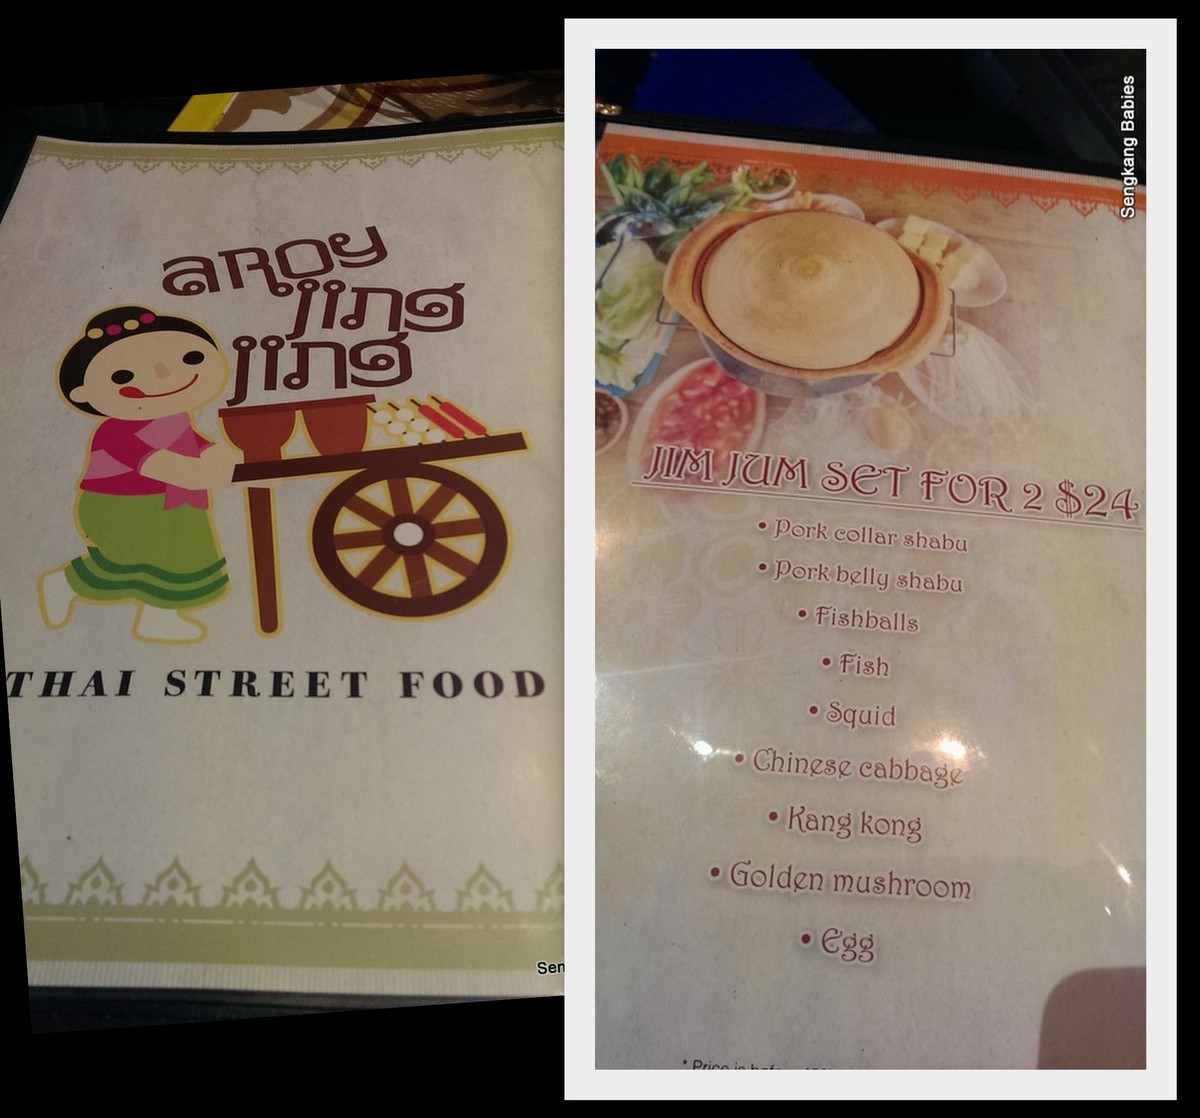 20151220 orto mookata and Aloy Jing Jing